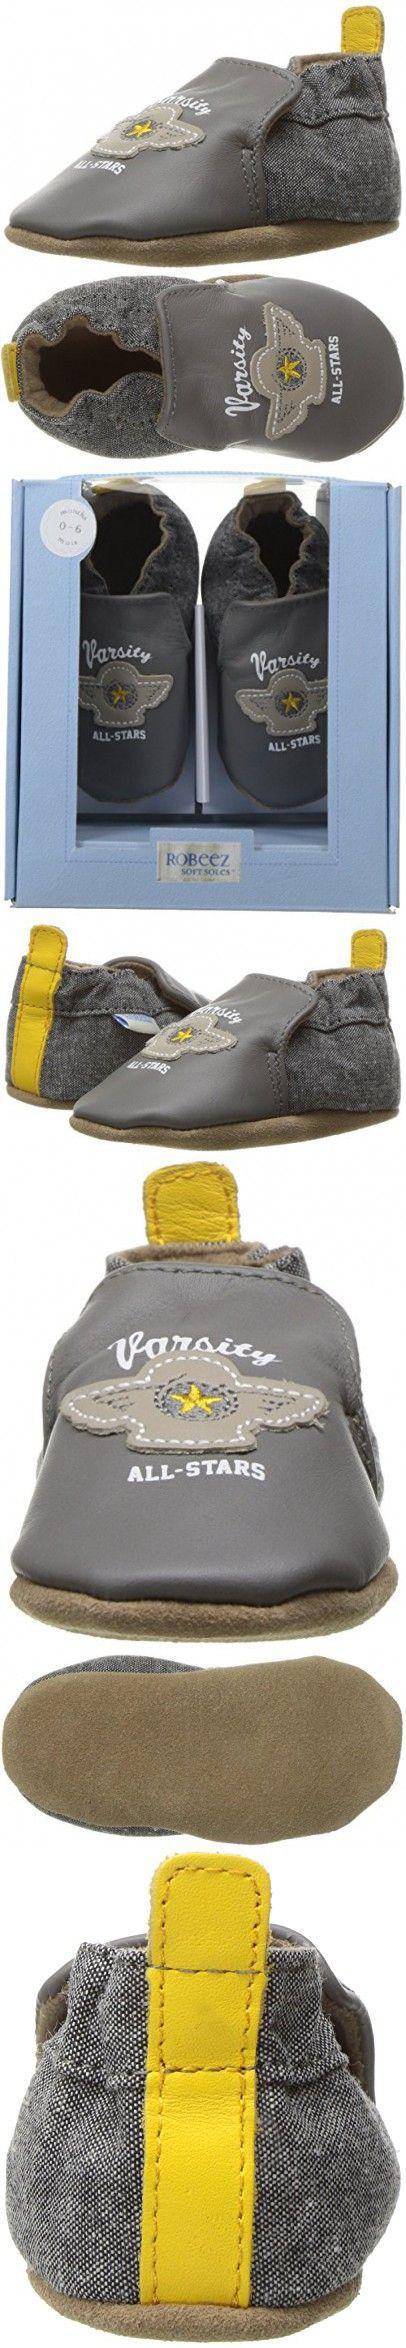 Robeez Boys' Puppy Love Crib Shoe, Varsity Dark Grey, 6-12 Months M US Infant